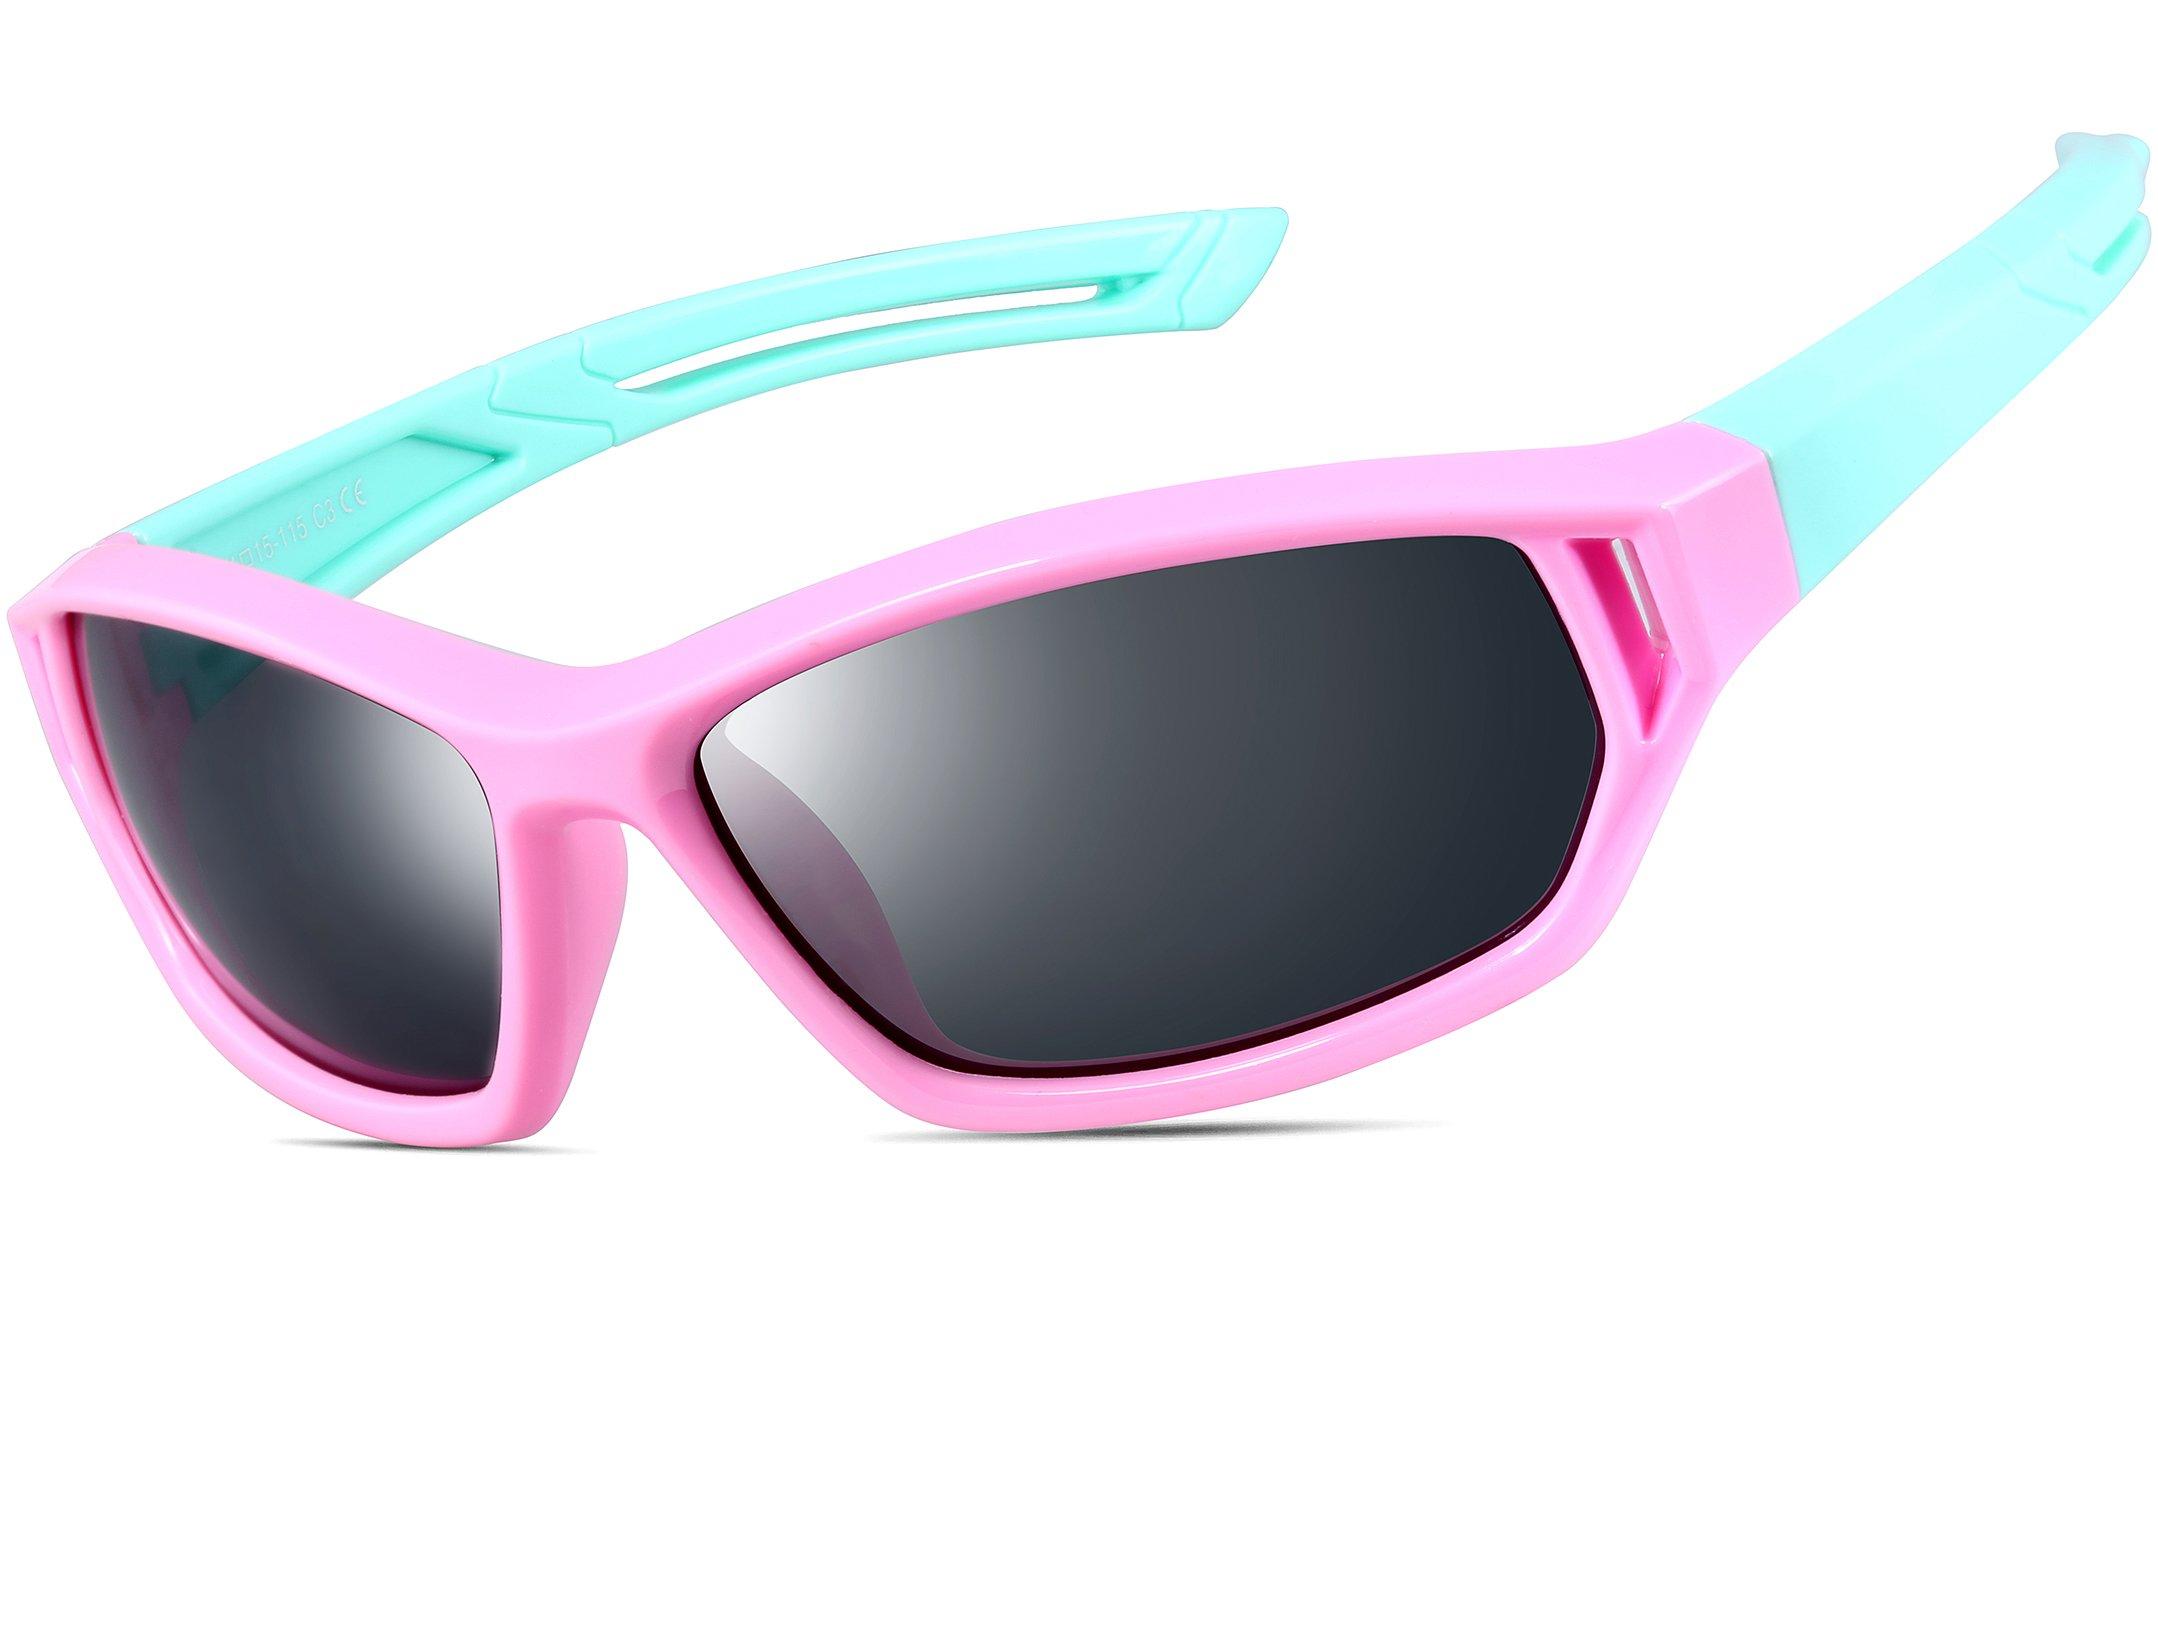 ATTCL Girls' Kids Sports TR90 Polarized Sunglasses Wayfarer Style For Boys Girls 864 Pink Blue